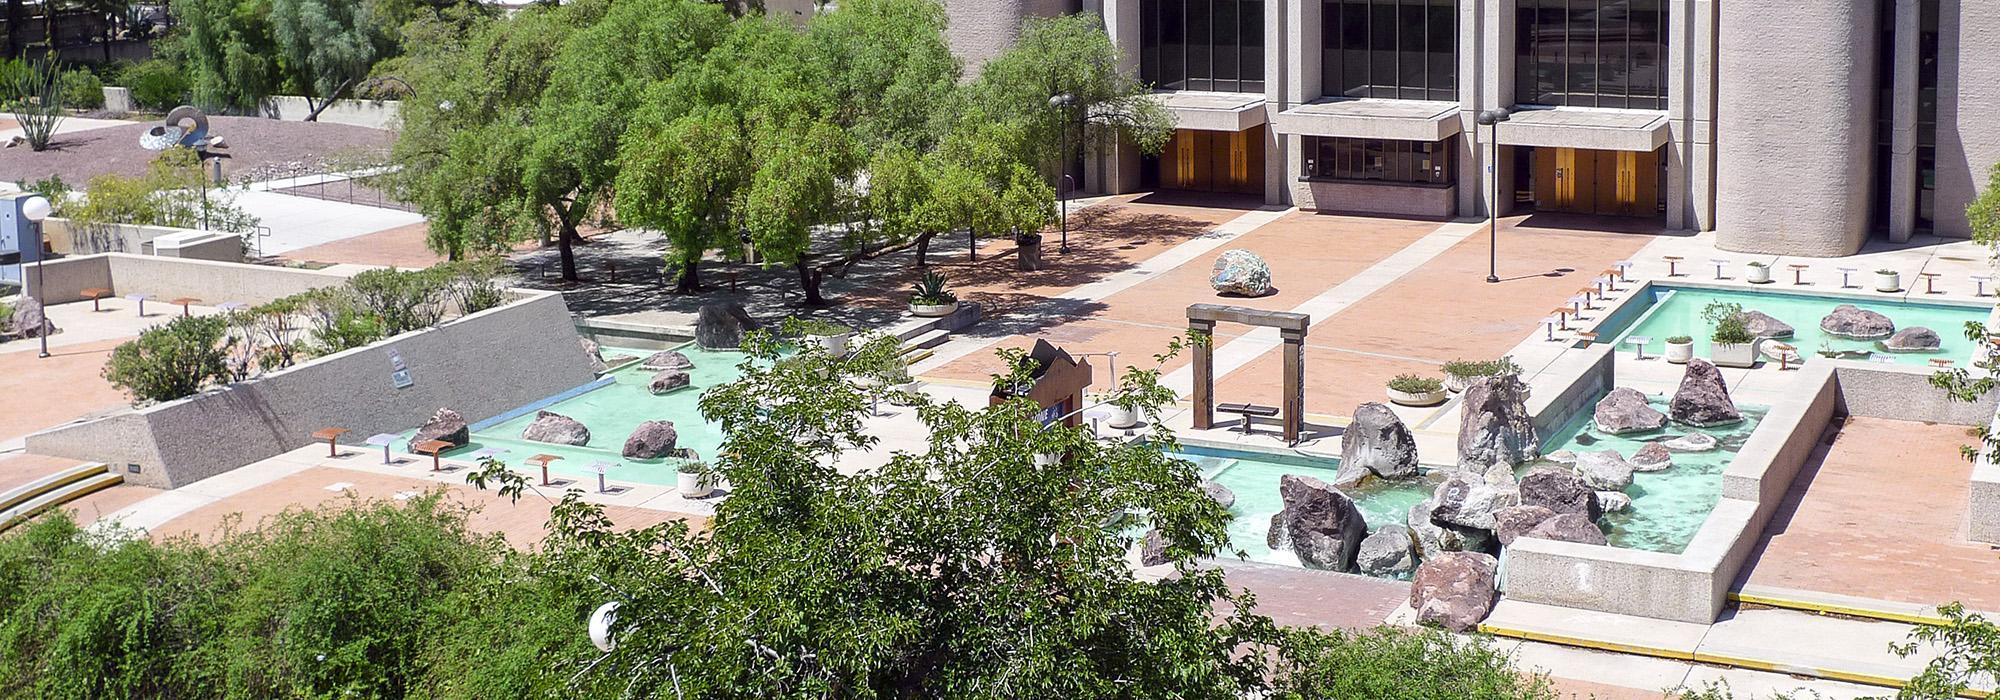 TucsonConventionCenter.jpg